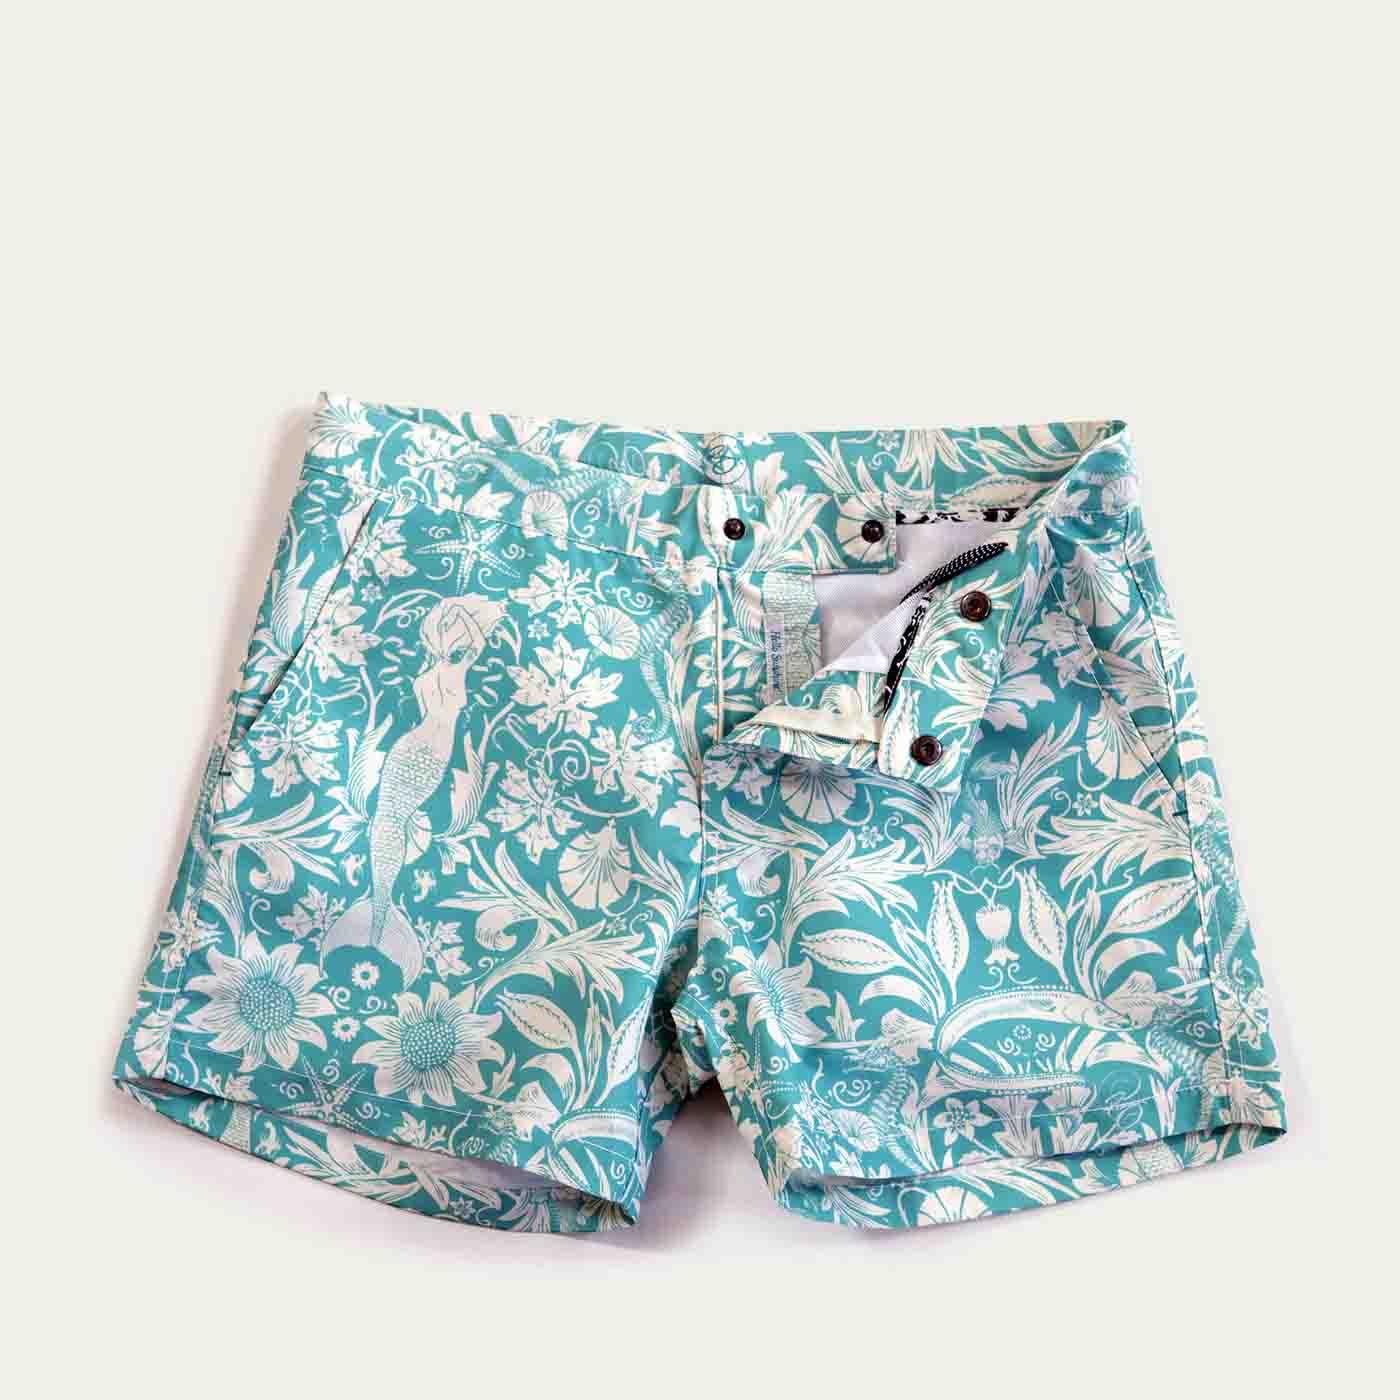 280447e75d Riz Boardshorts | Vintage Morris Sea Buckler Swim Short | Bombinate